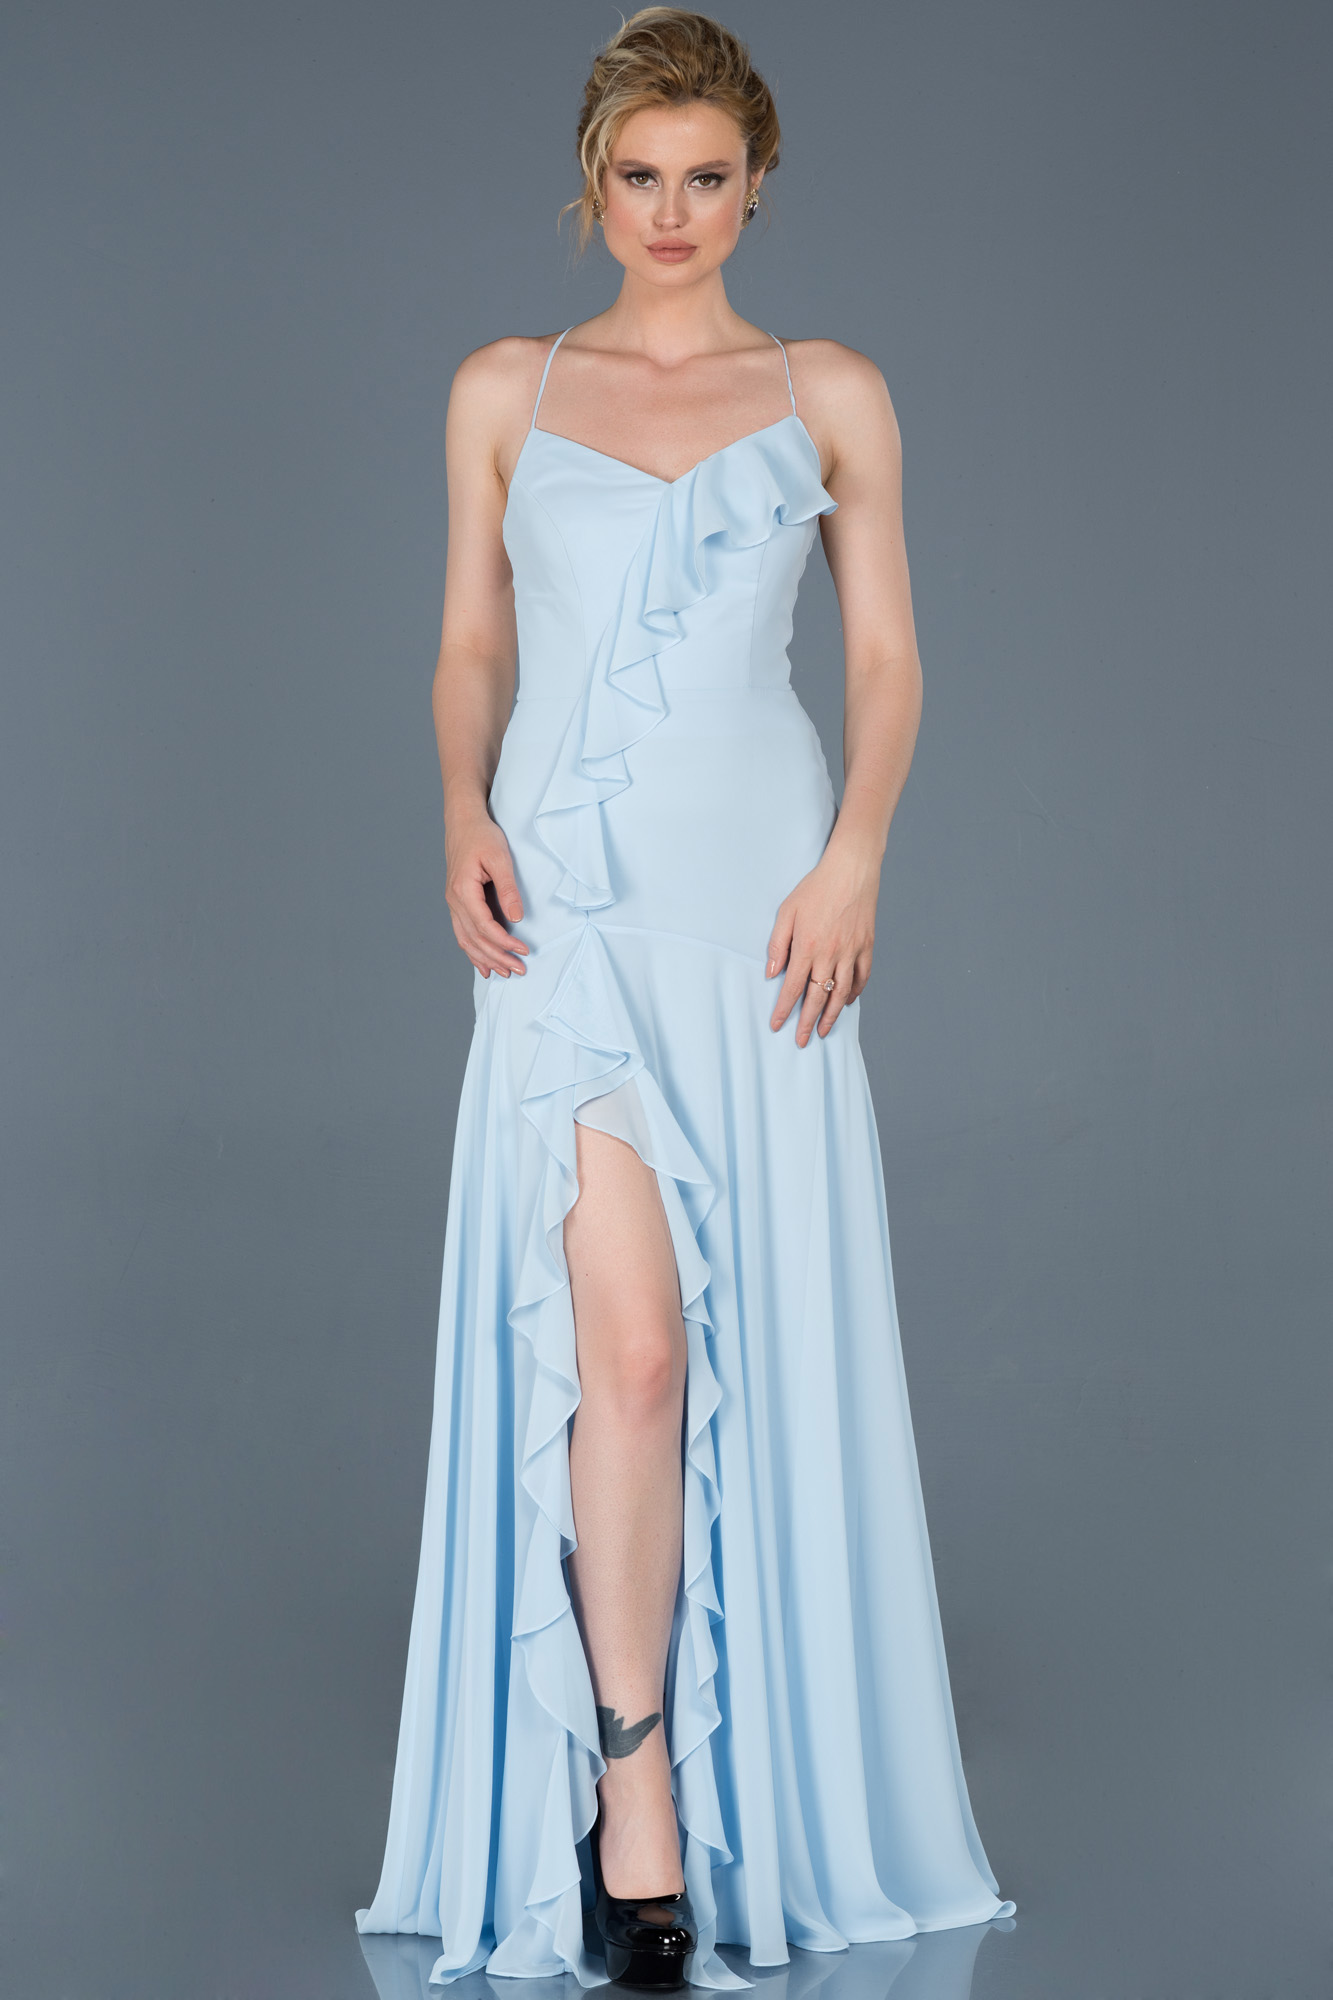 Buz Mavisi Uzun Bacak Dekolteli Mezuniyet Elbisesi